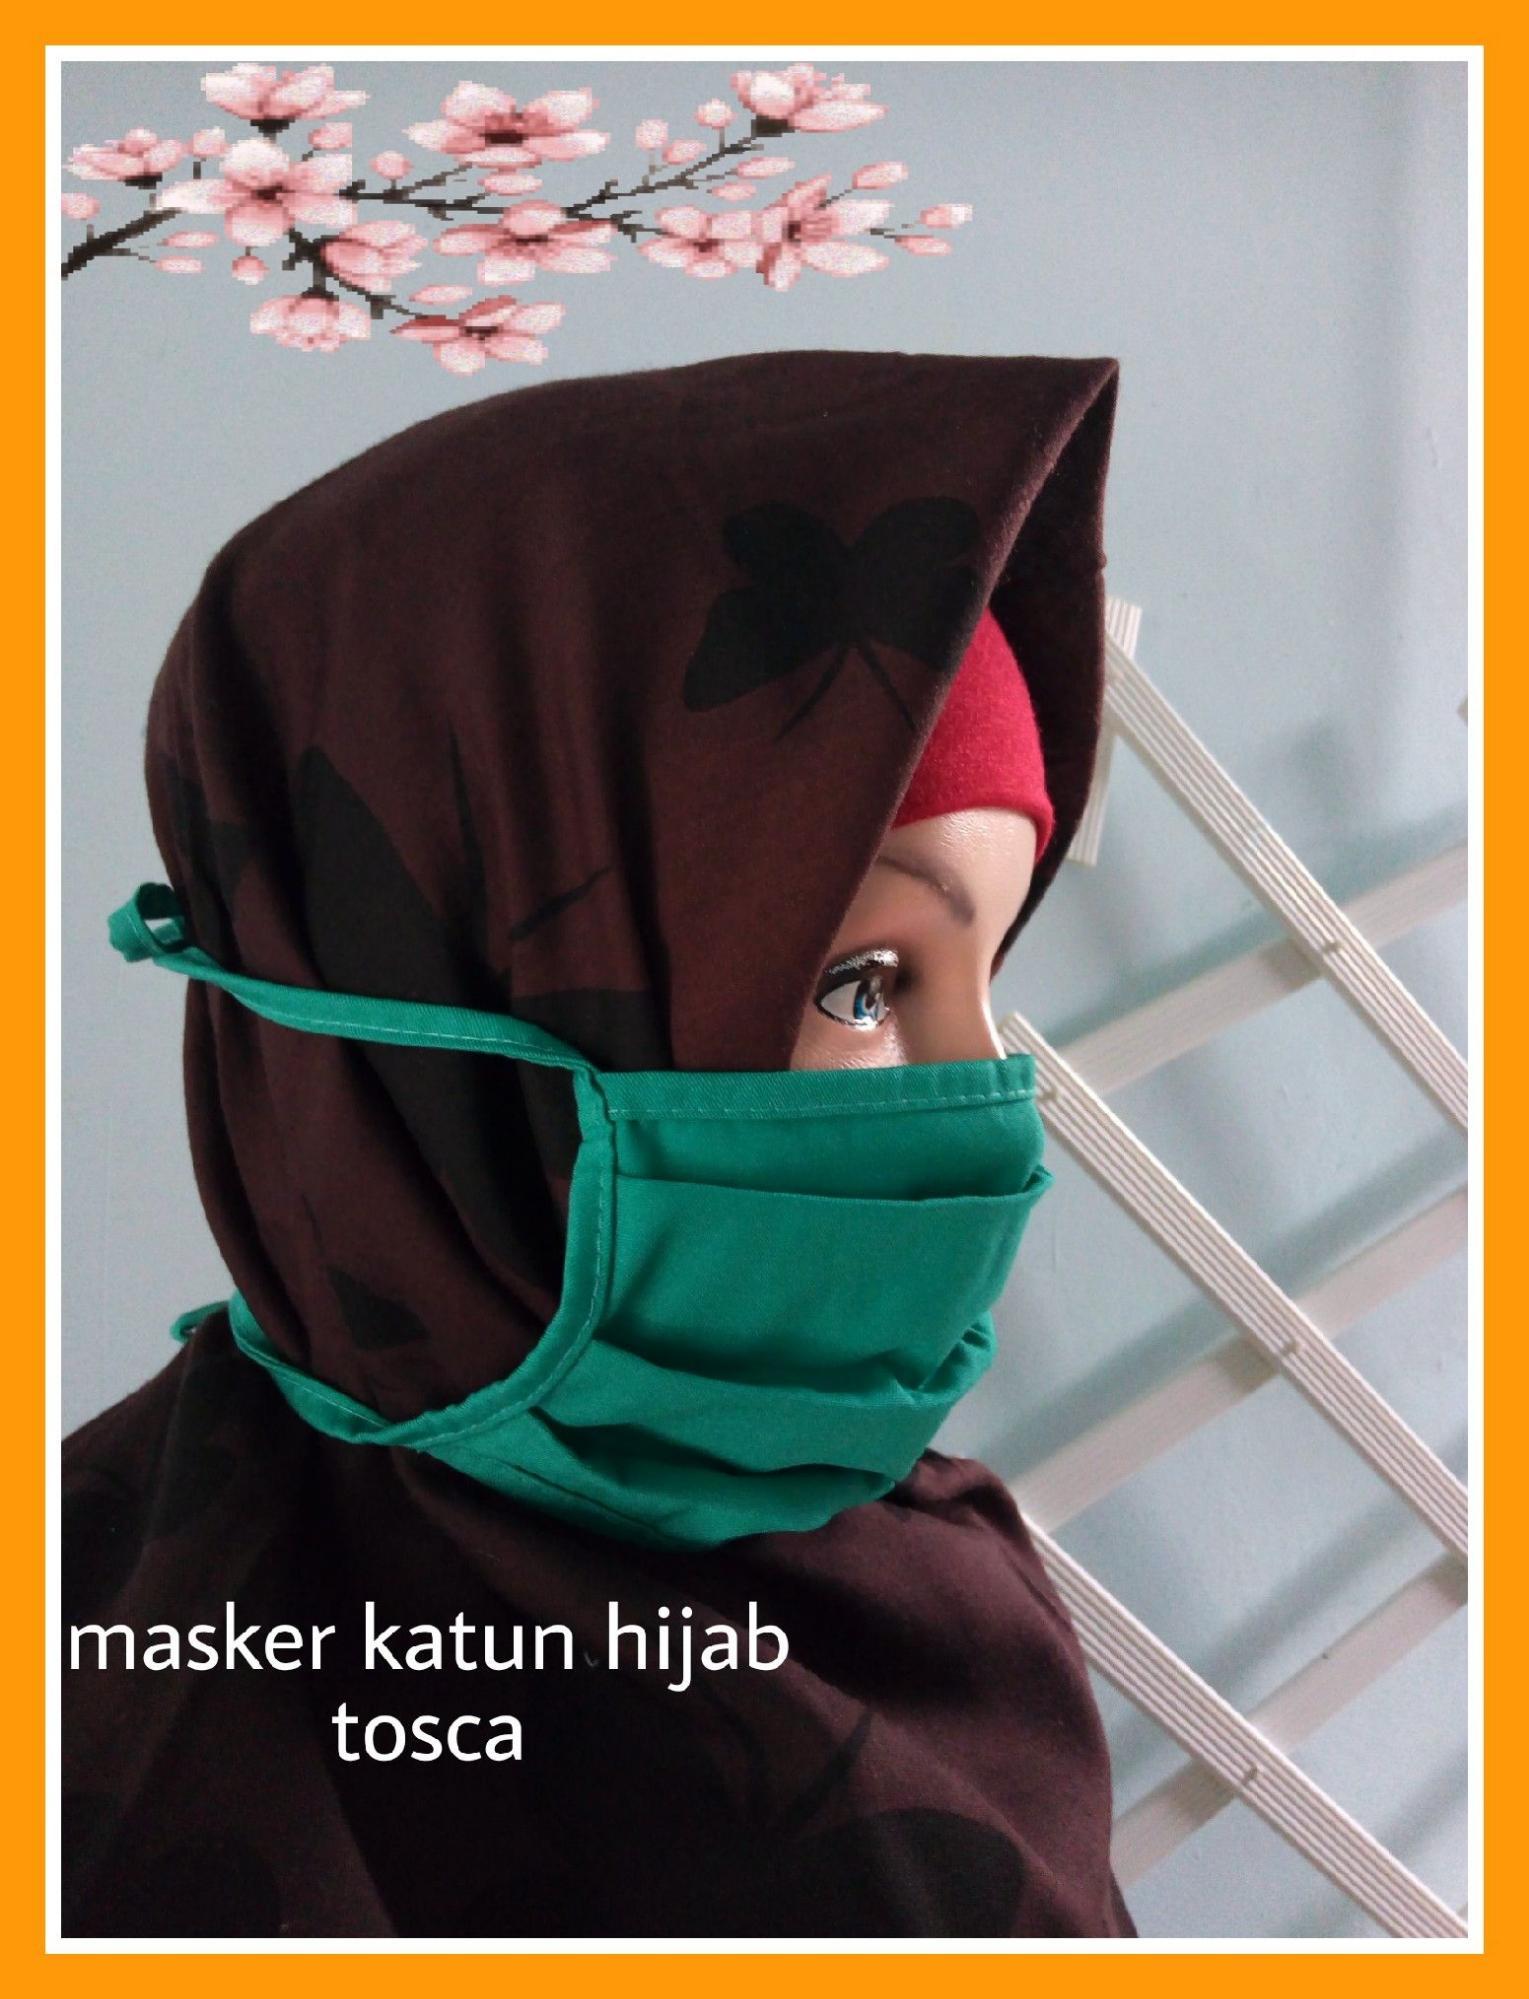 Kehebatan V Line Wajah Pipi Mengangkat Slimming Slim Masker Sabuk Tirus Bioaqua Shaped Penirus Kain Hijab Kerudung Jilbab Tali Sambung Tukiyem13